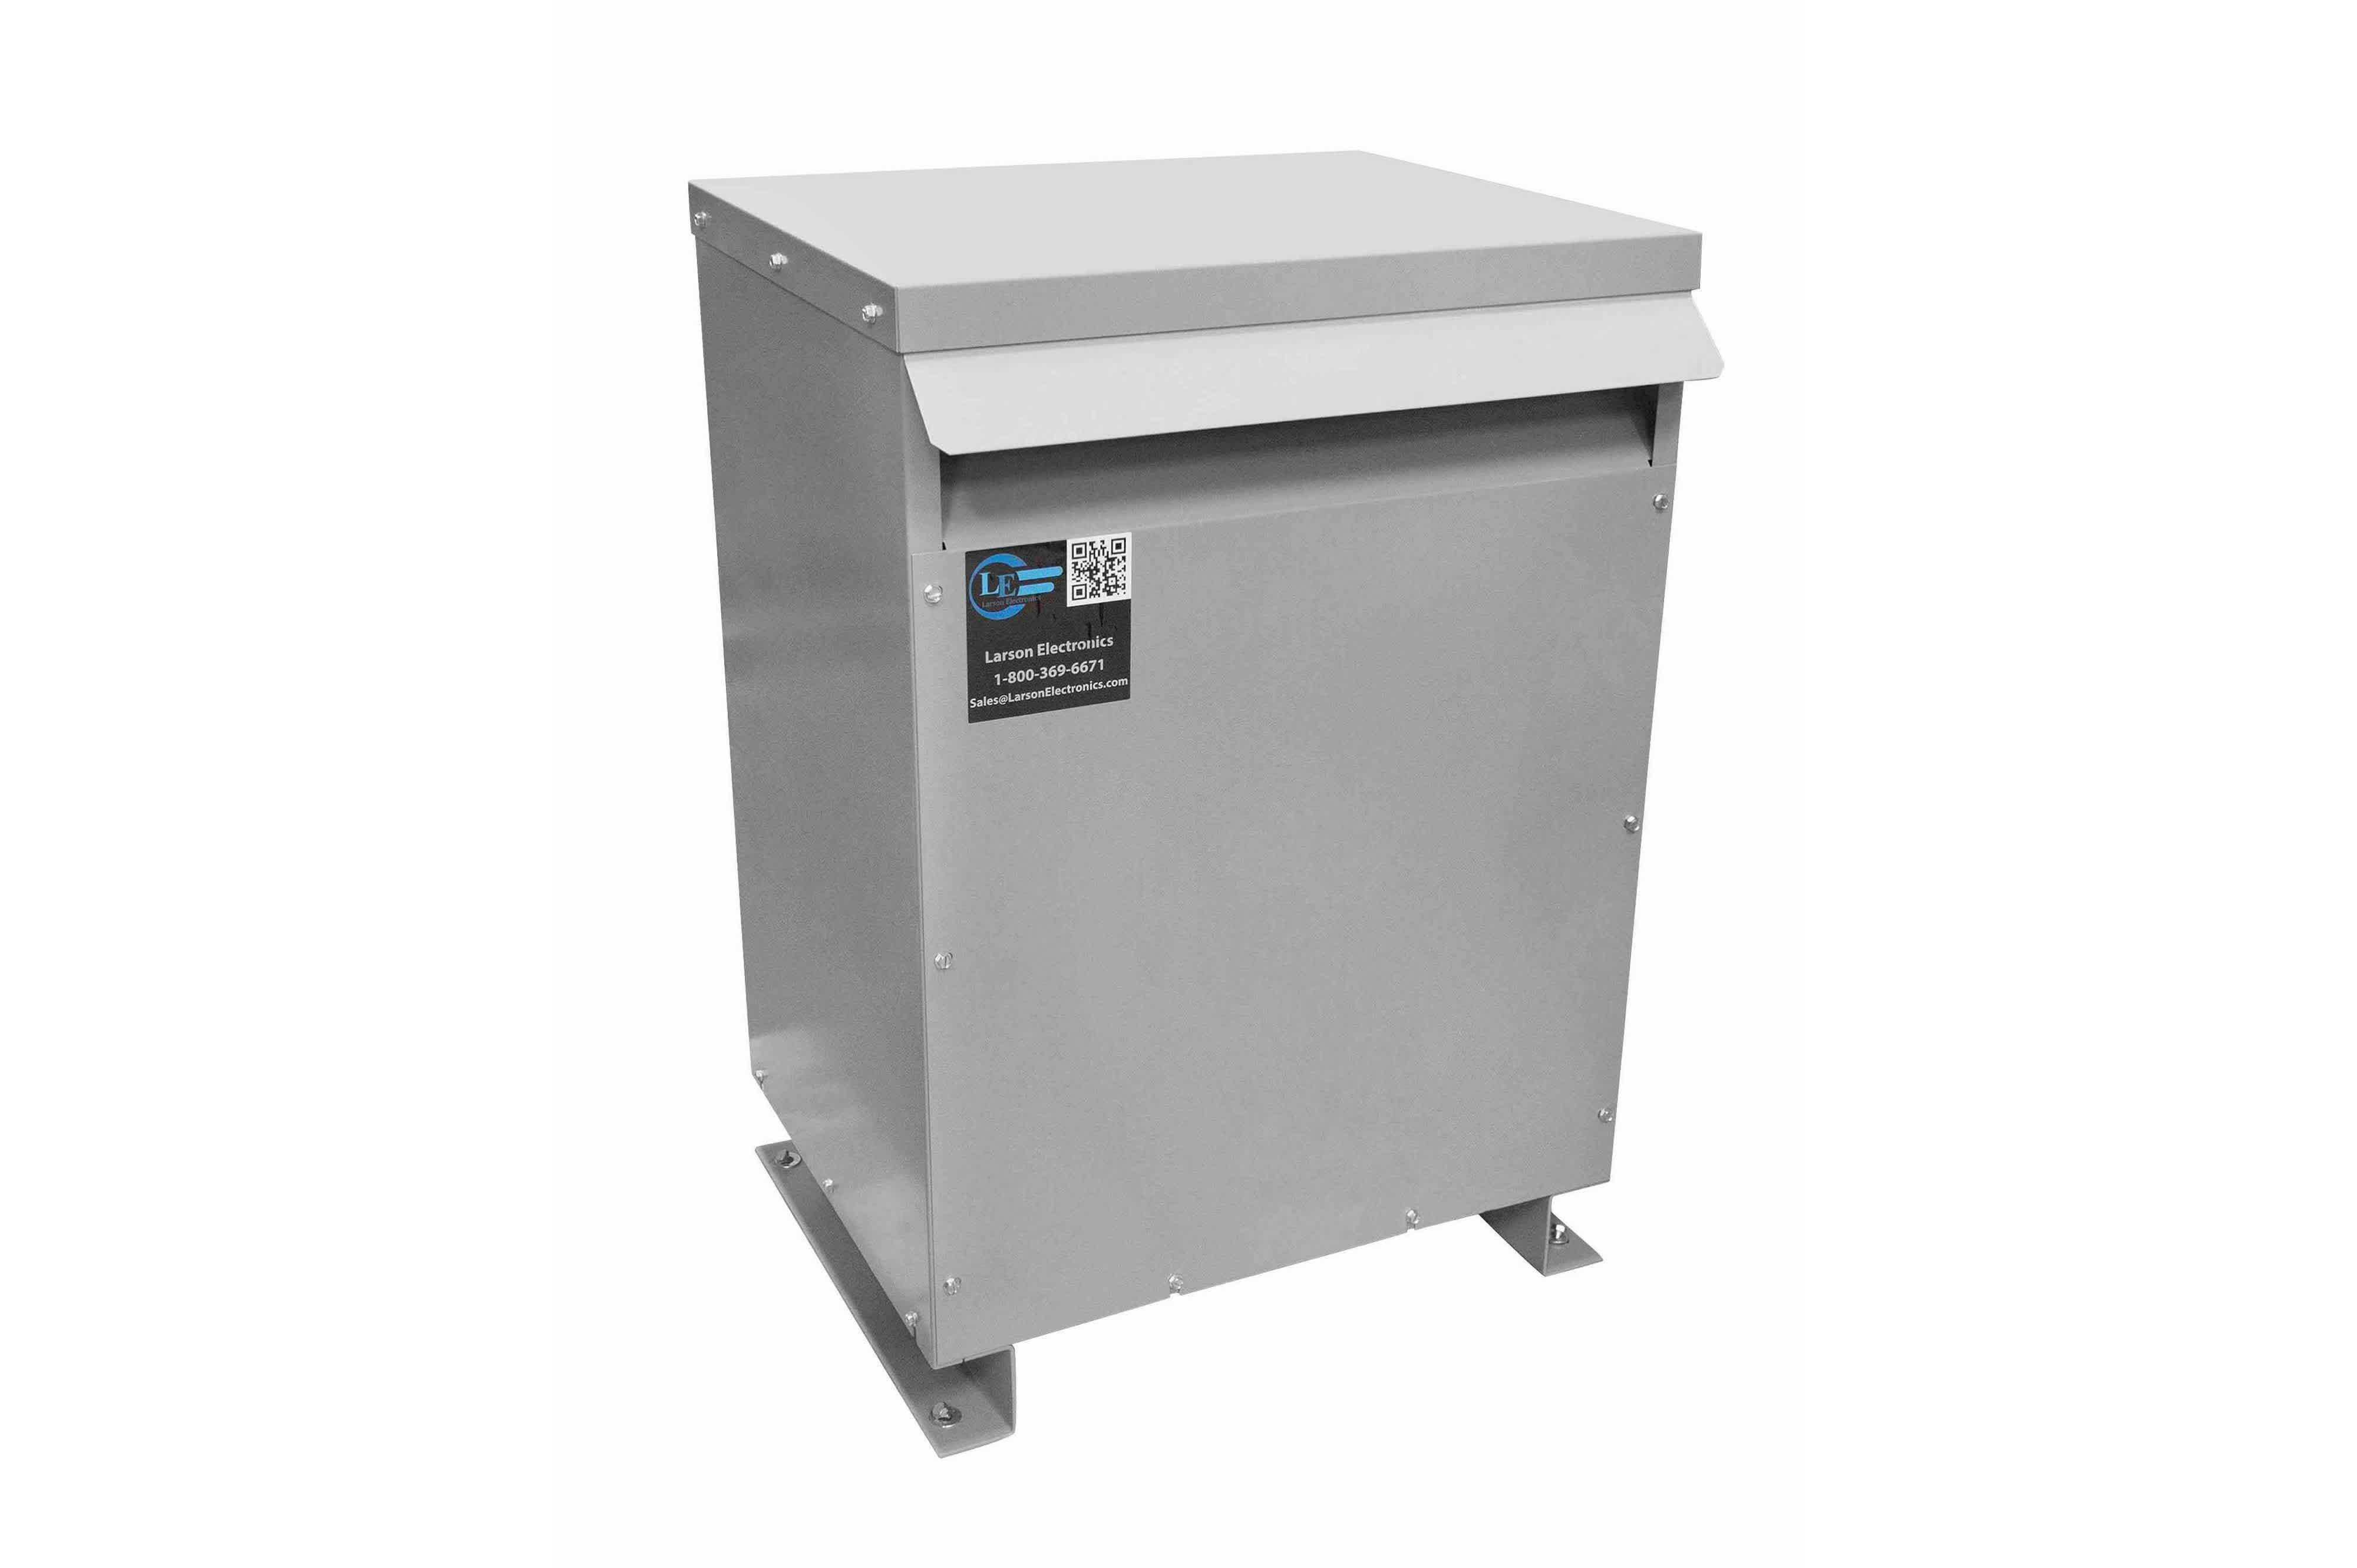 47.5 kVA 3PH Isolation Transformer, 415V Wye Primary, 480Y/277 Wye-N Secondary, N3R, Ventilated, 60 Hz